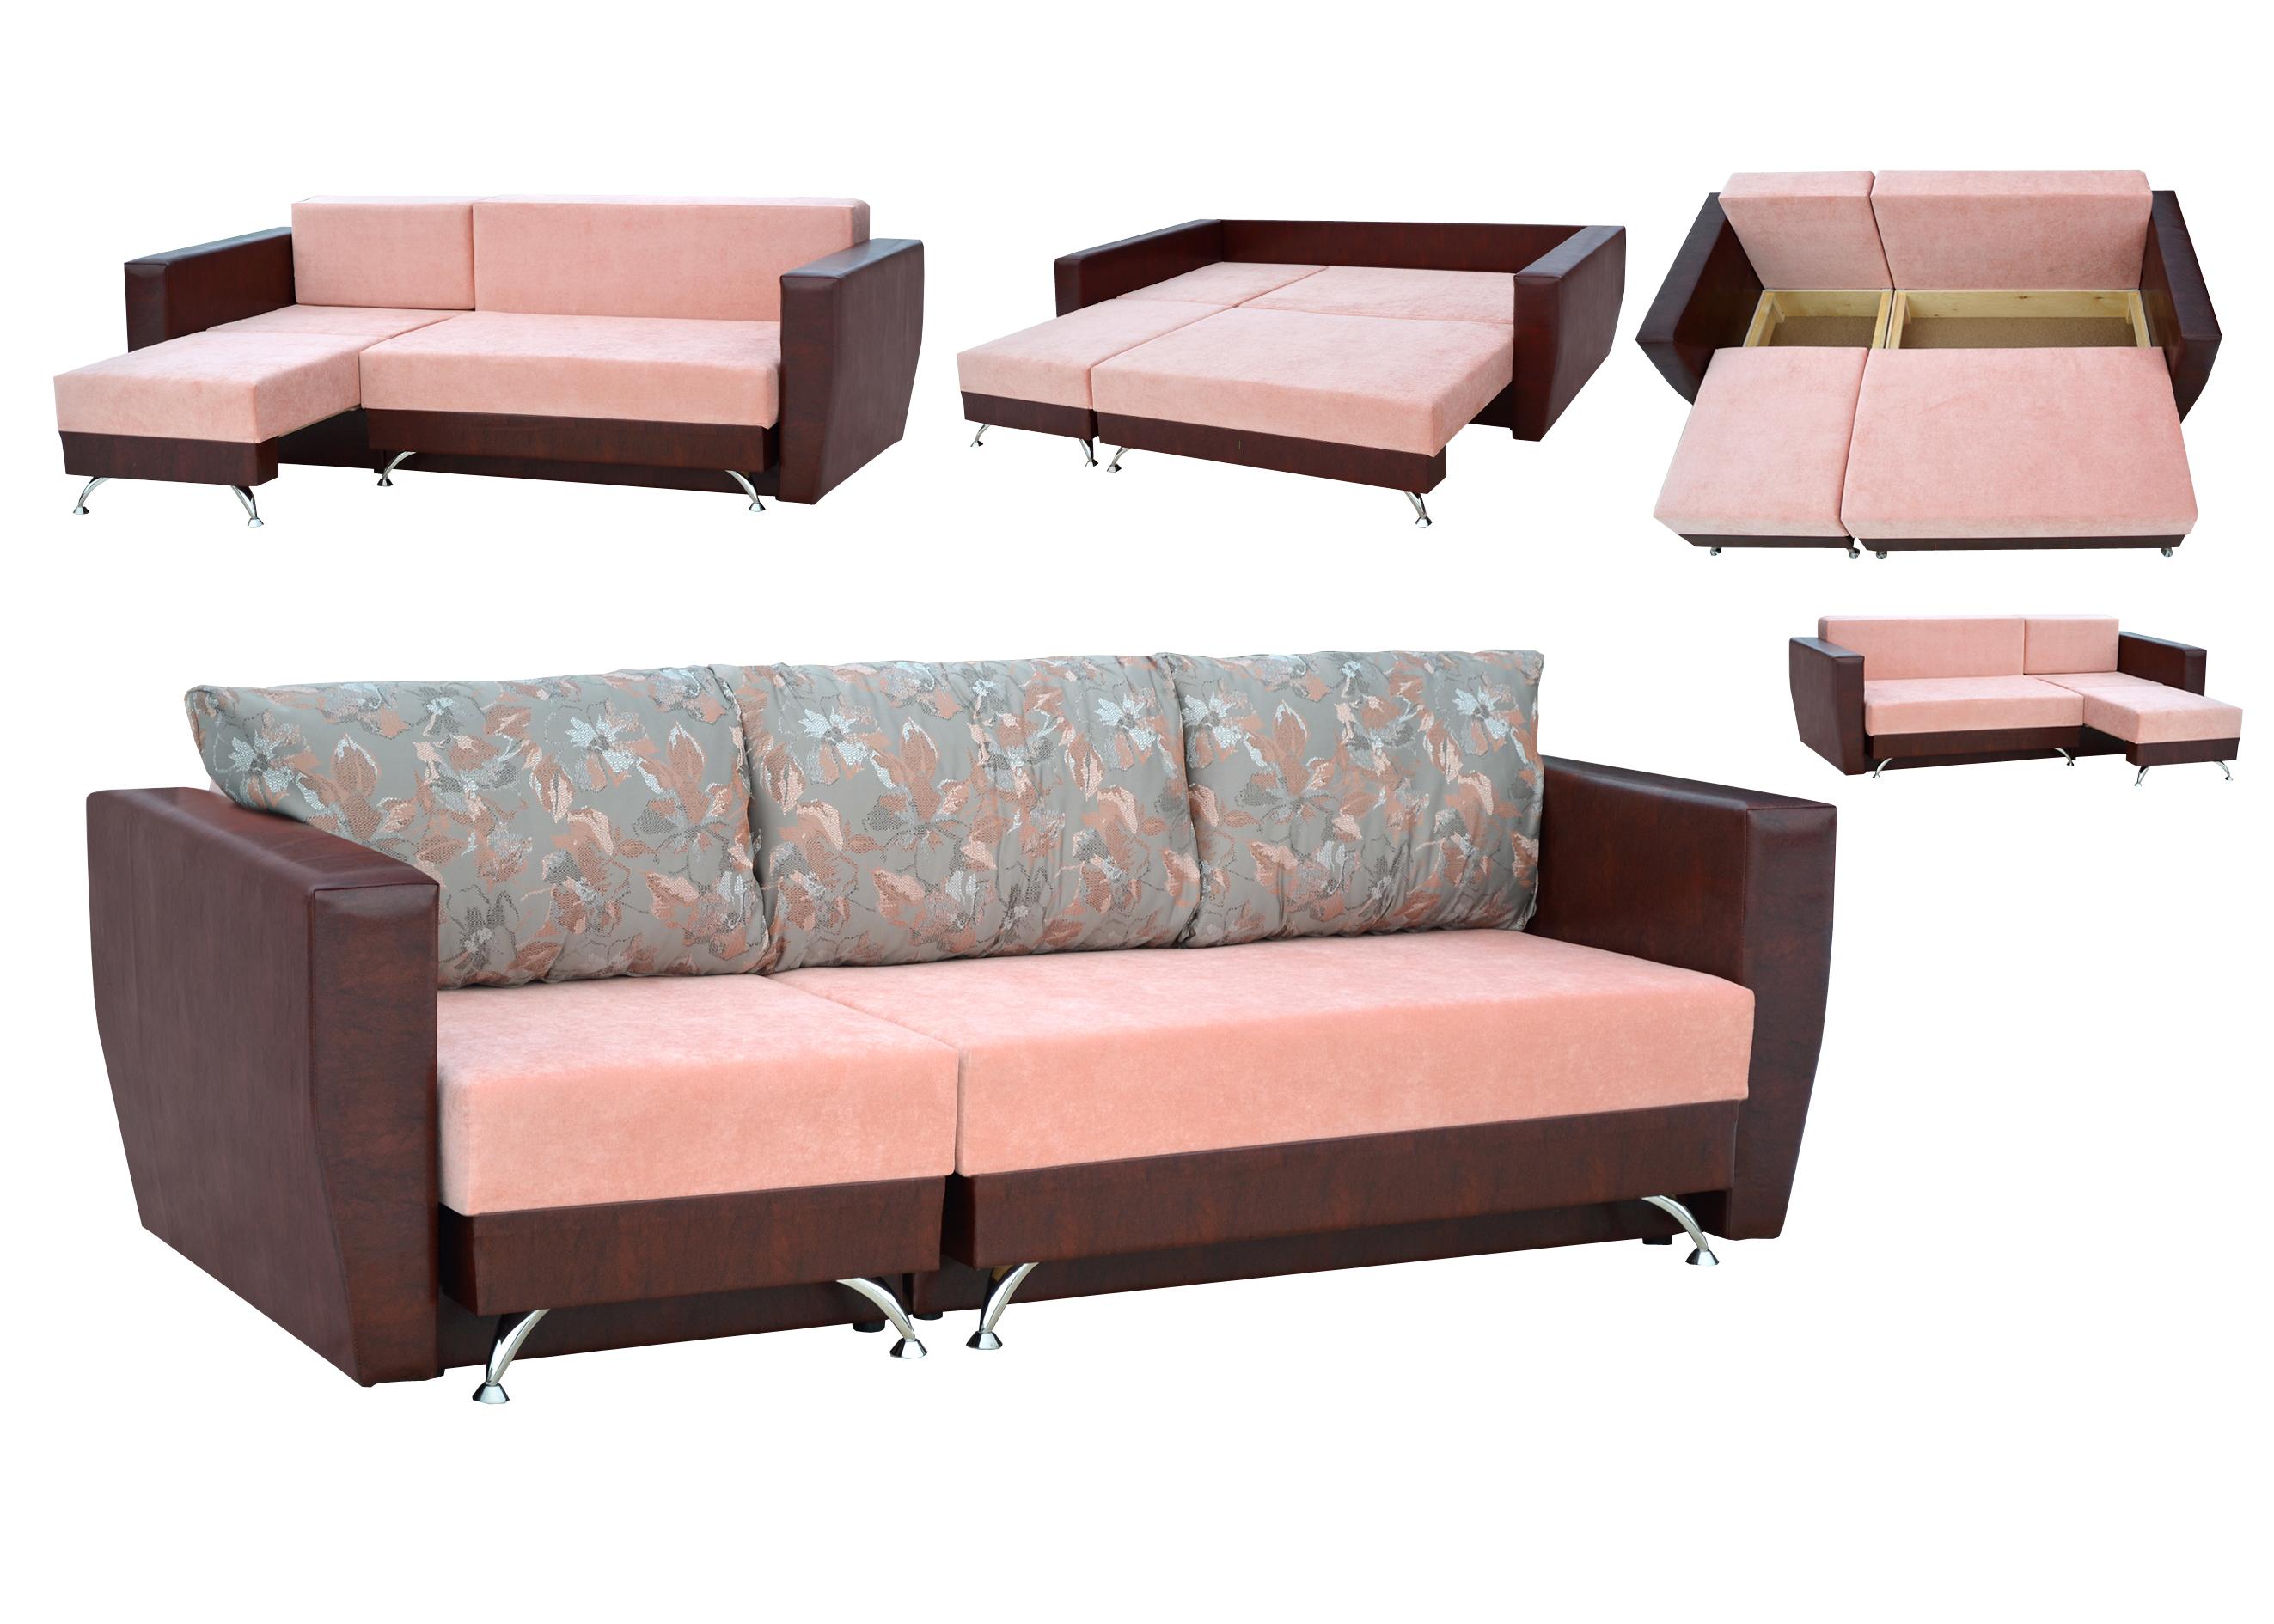 Купи диван ру с доставкой